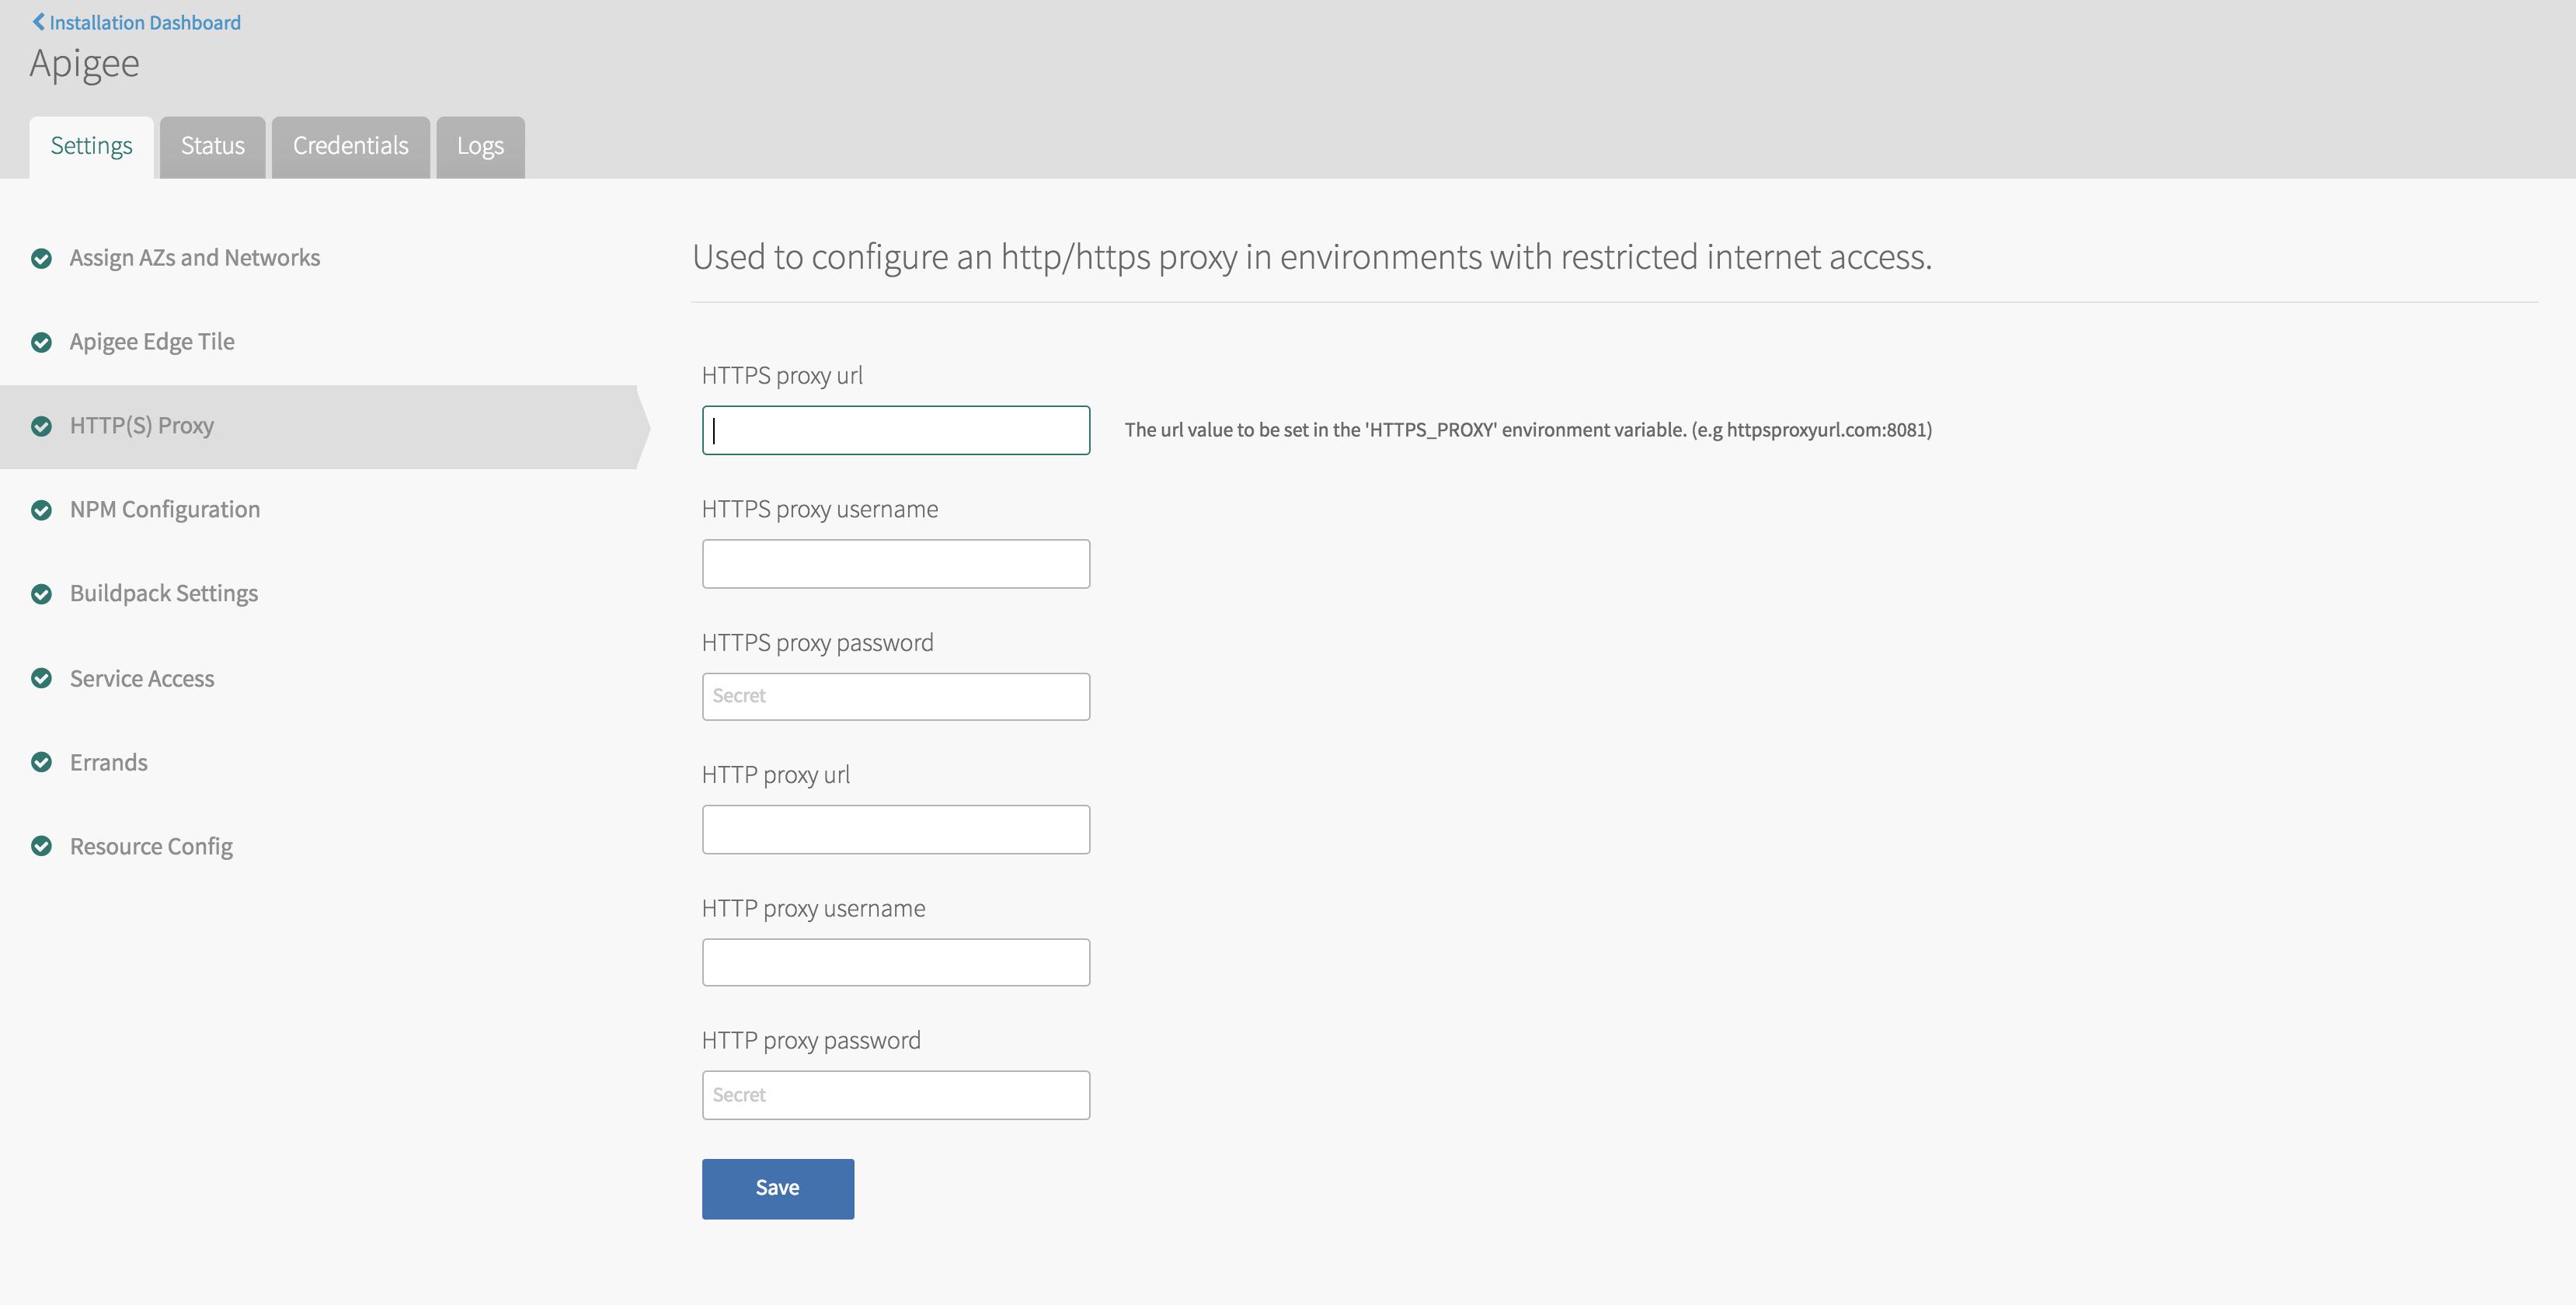 Apigee Edge NPM configuration